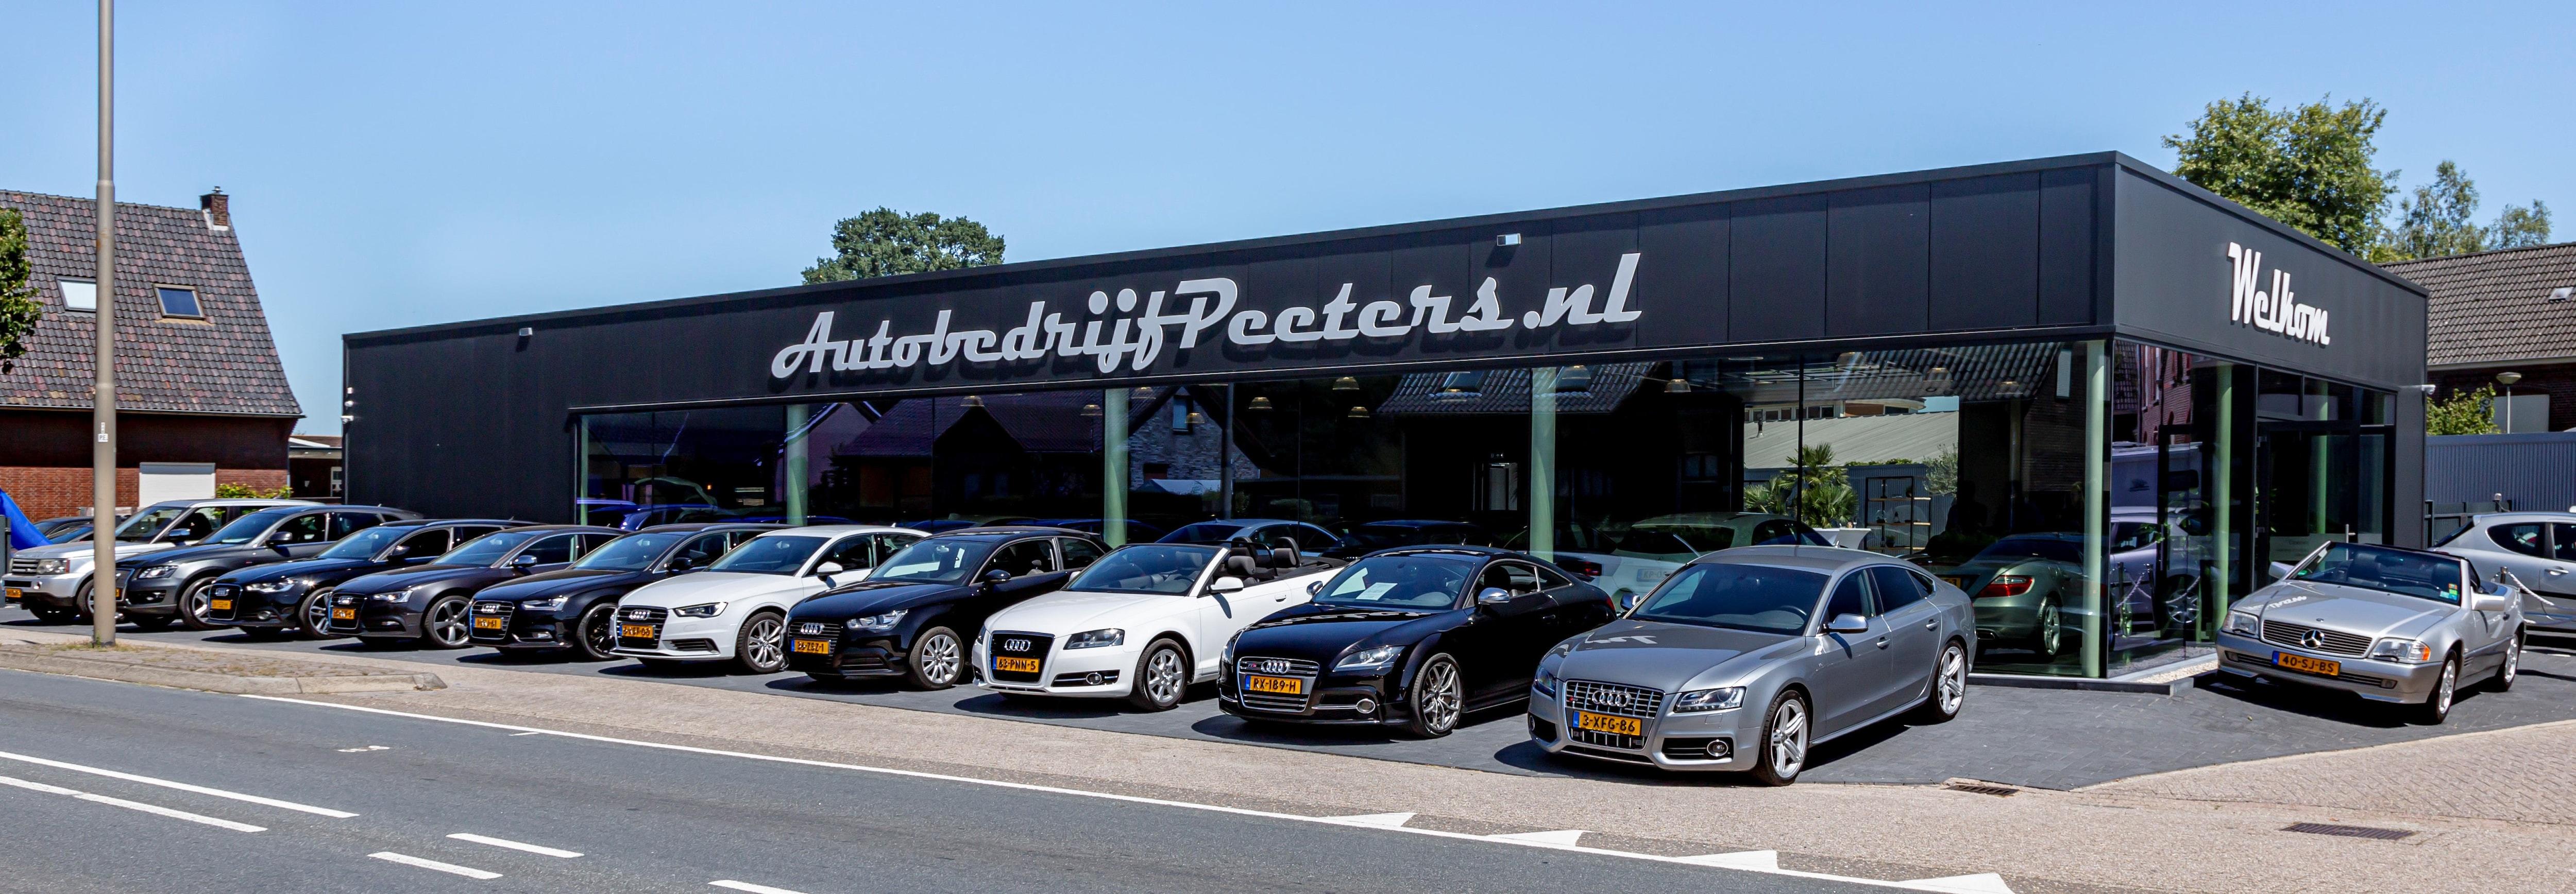 Autobedrijf Peeters BV